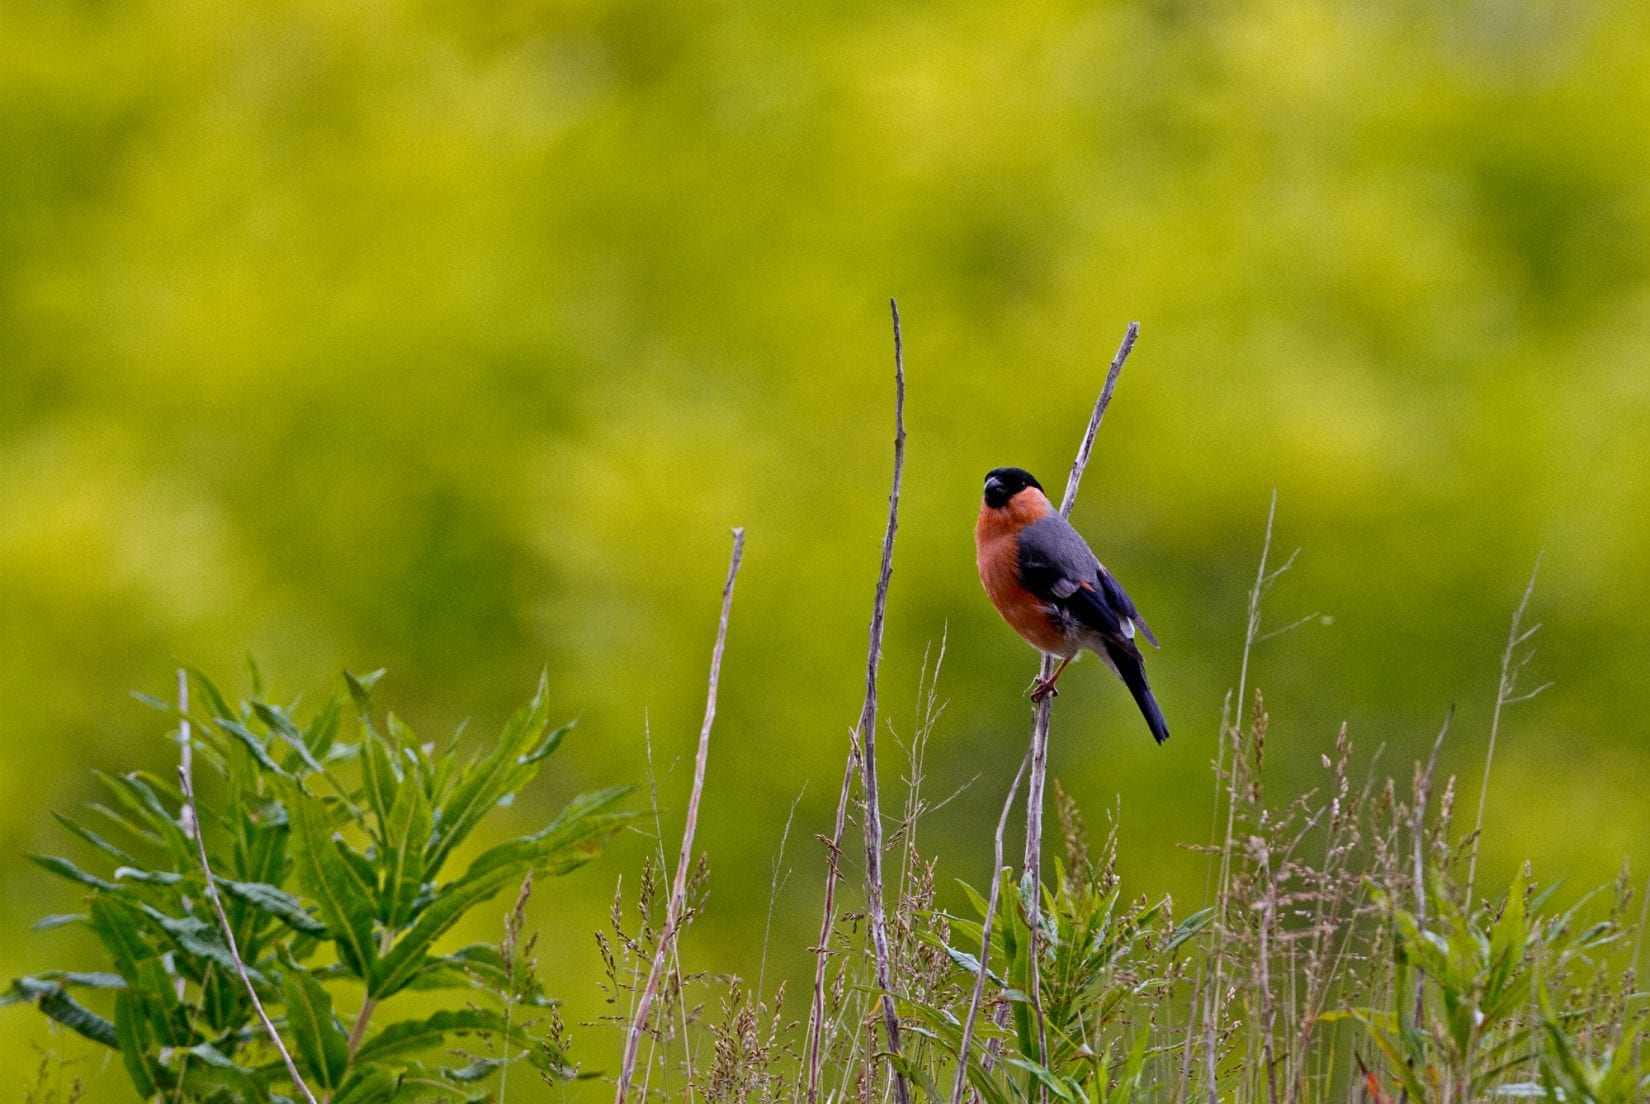 male-bullfinch-in-the distance